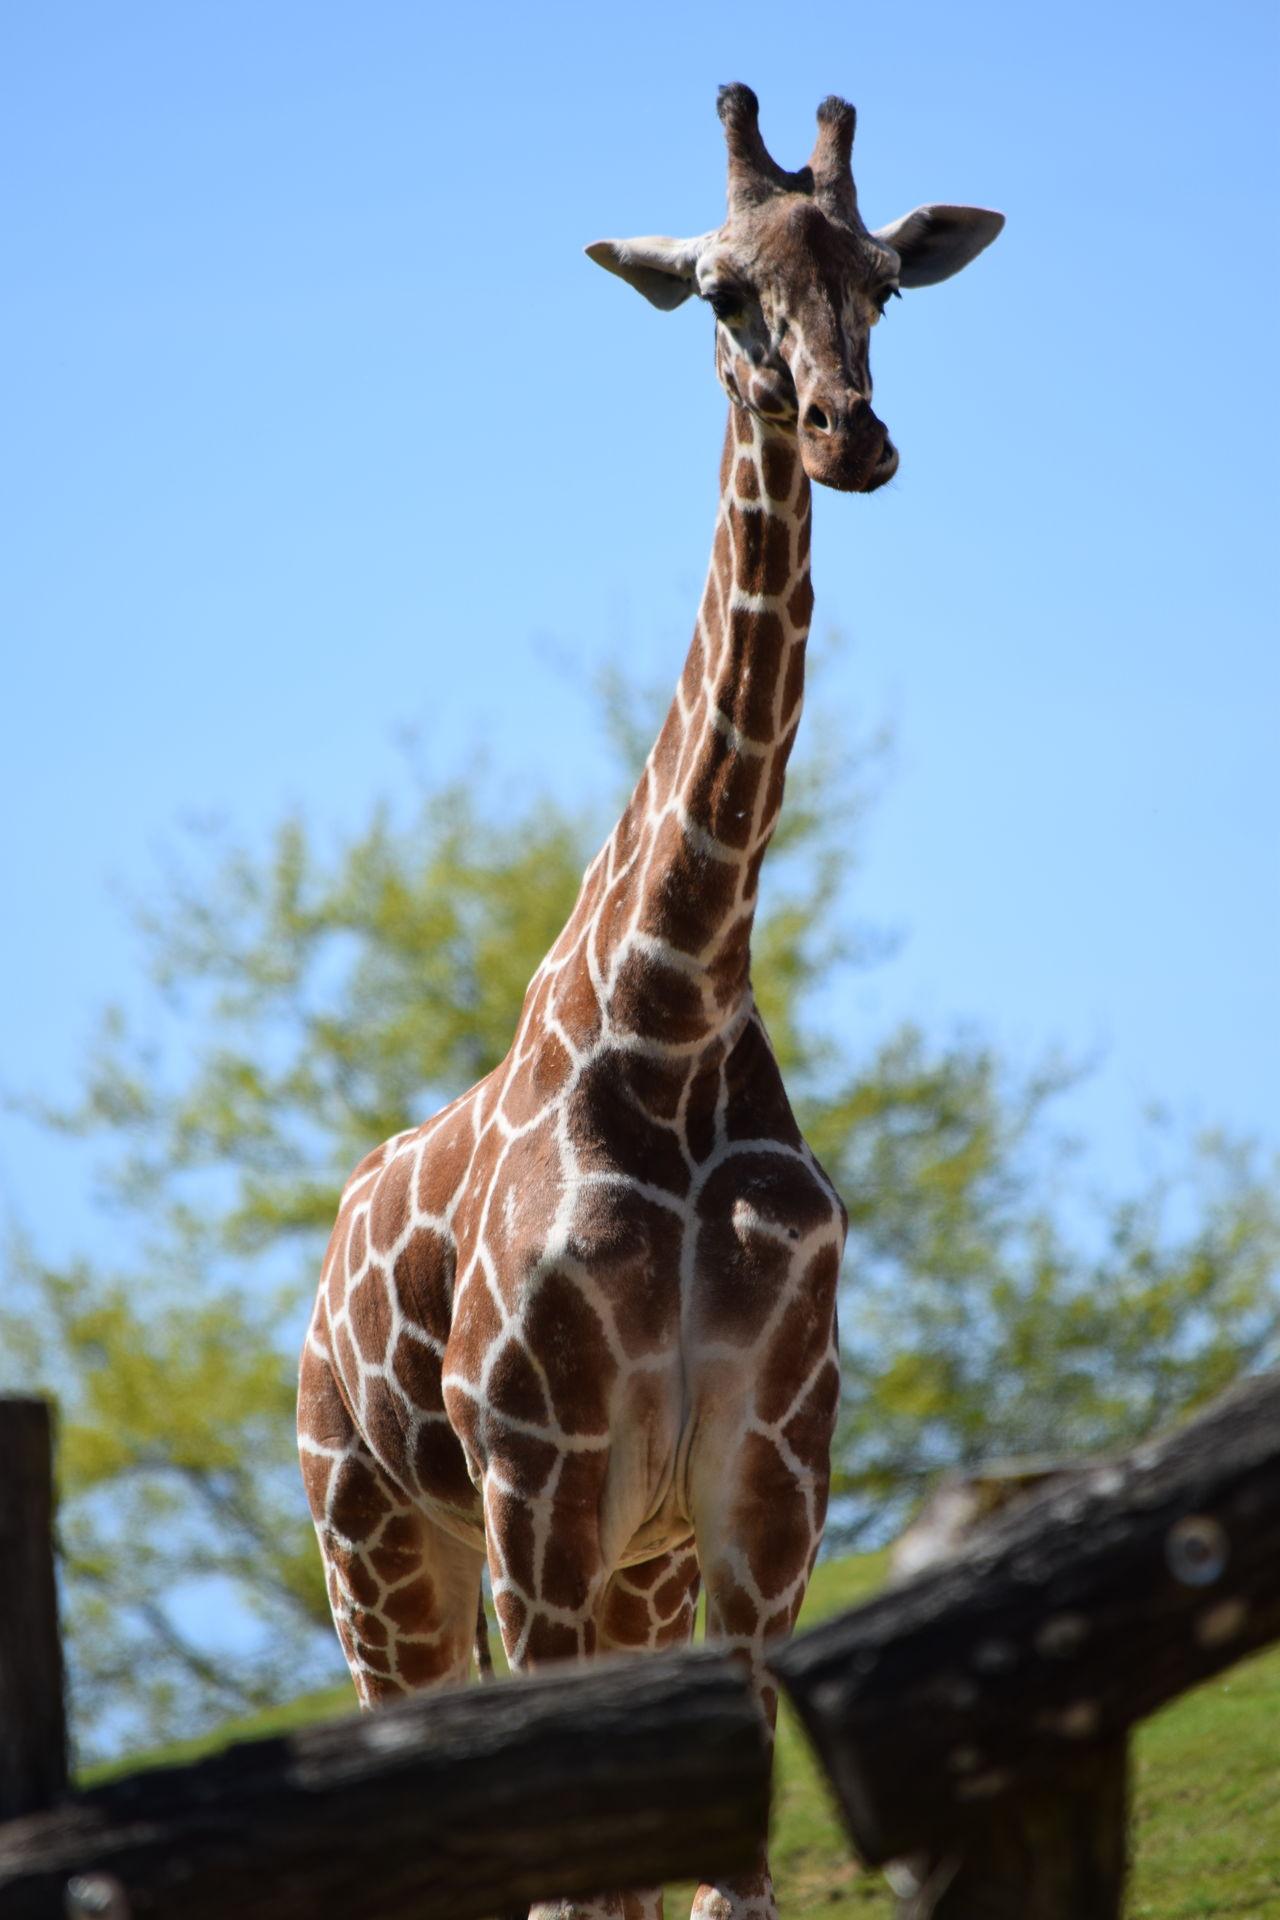 giraffe Animal Themes Animal Wildlife Animals In The Wild Clear Sky Close-up Day Giraffe Mammal Nature No People One Animal Outdoors Safari Animals Sky Standing Tree